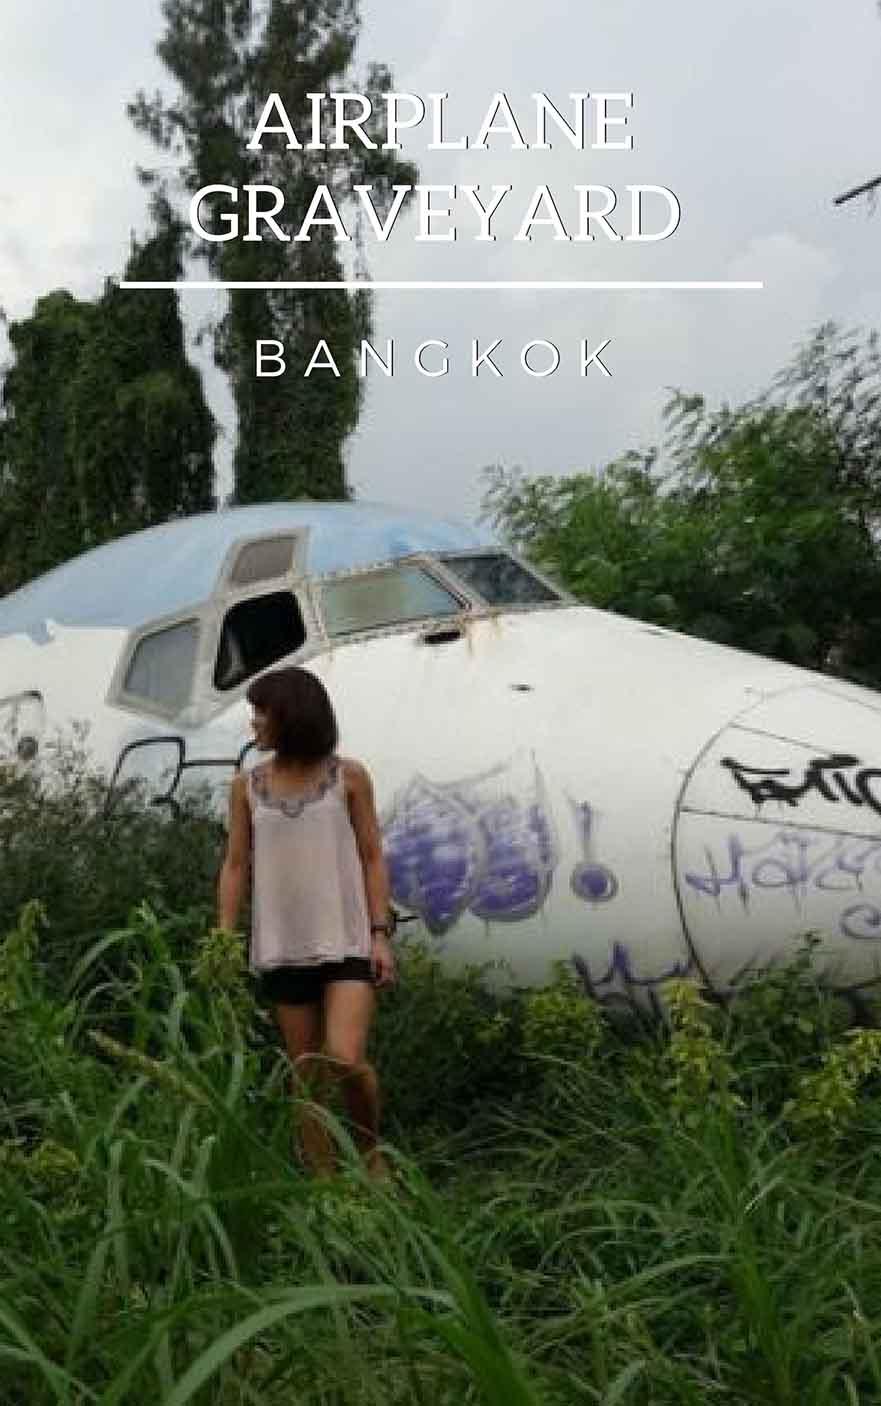 Exploring the Airplane Graveyard hidden in Bangkok